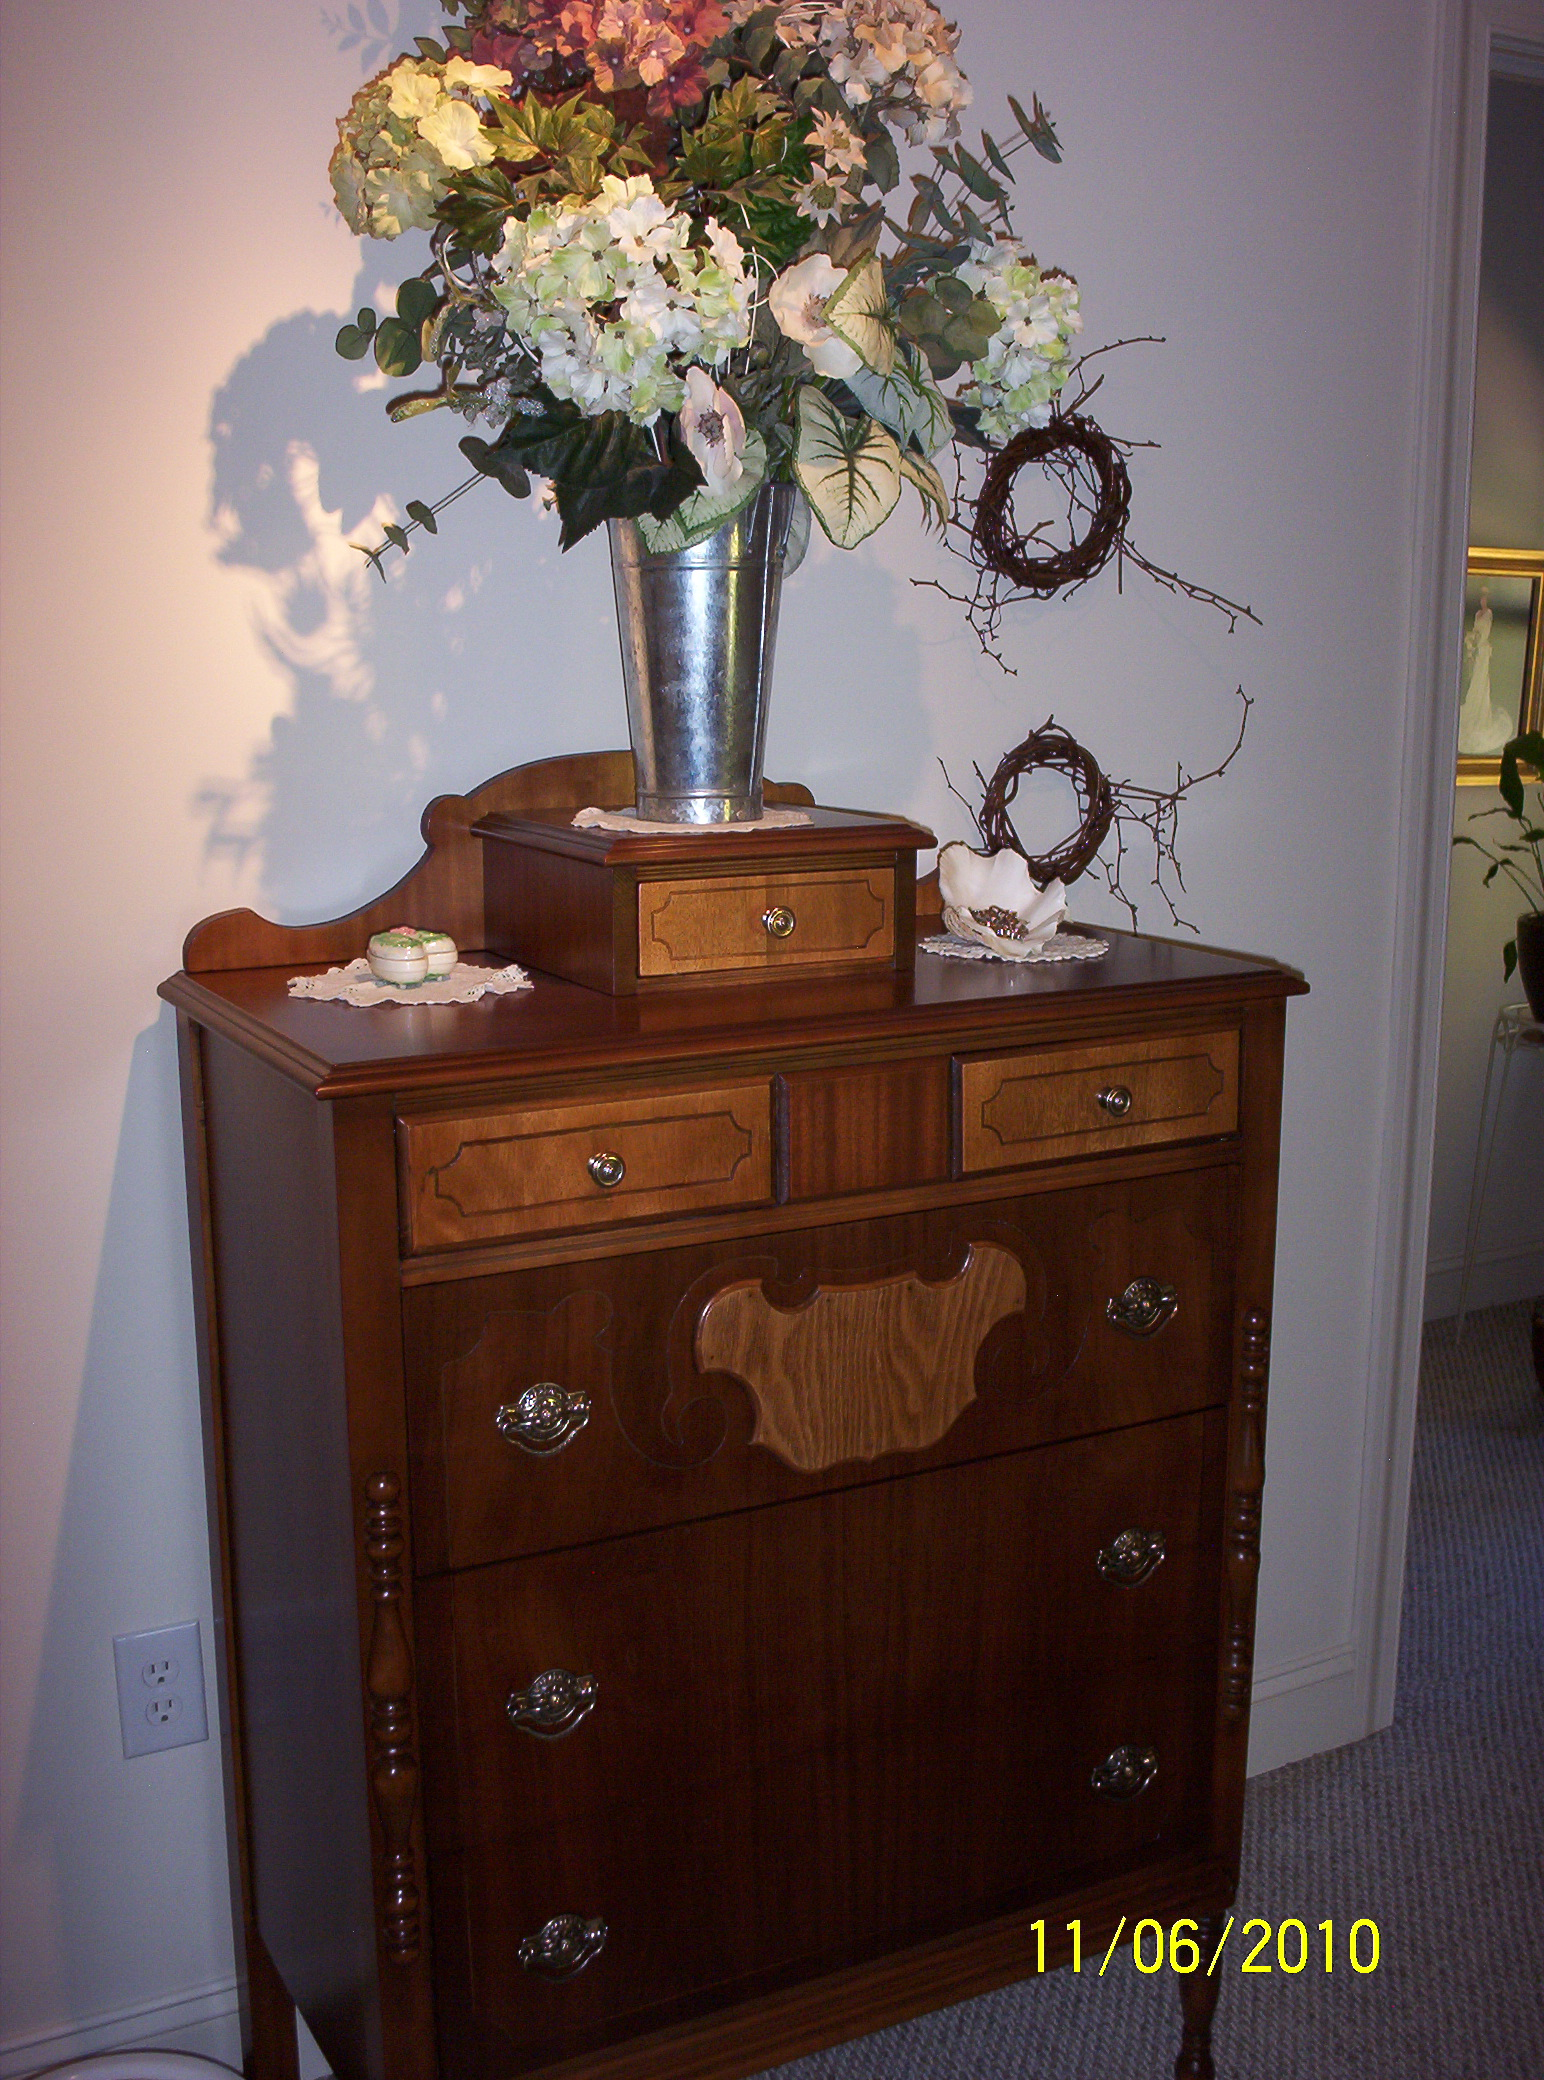 dGray s Furniture LLC wel e